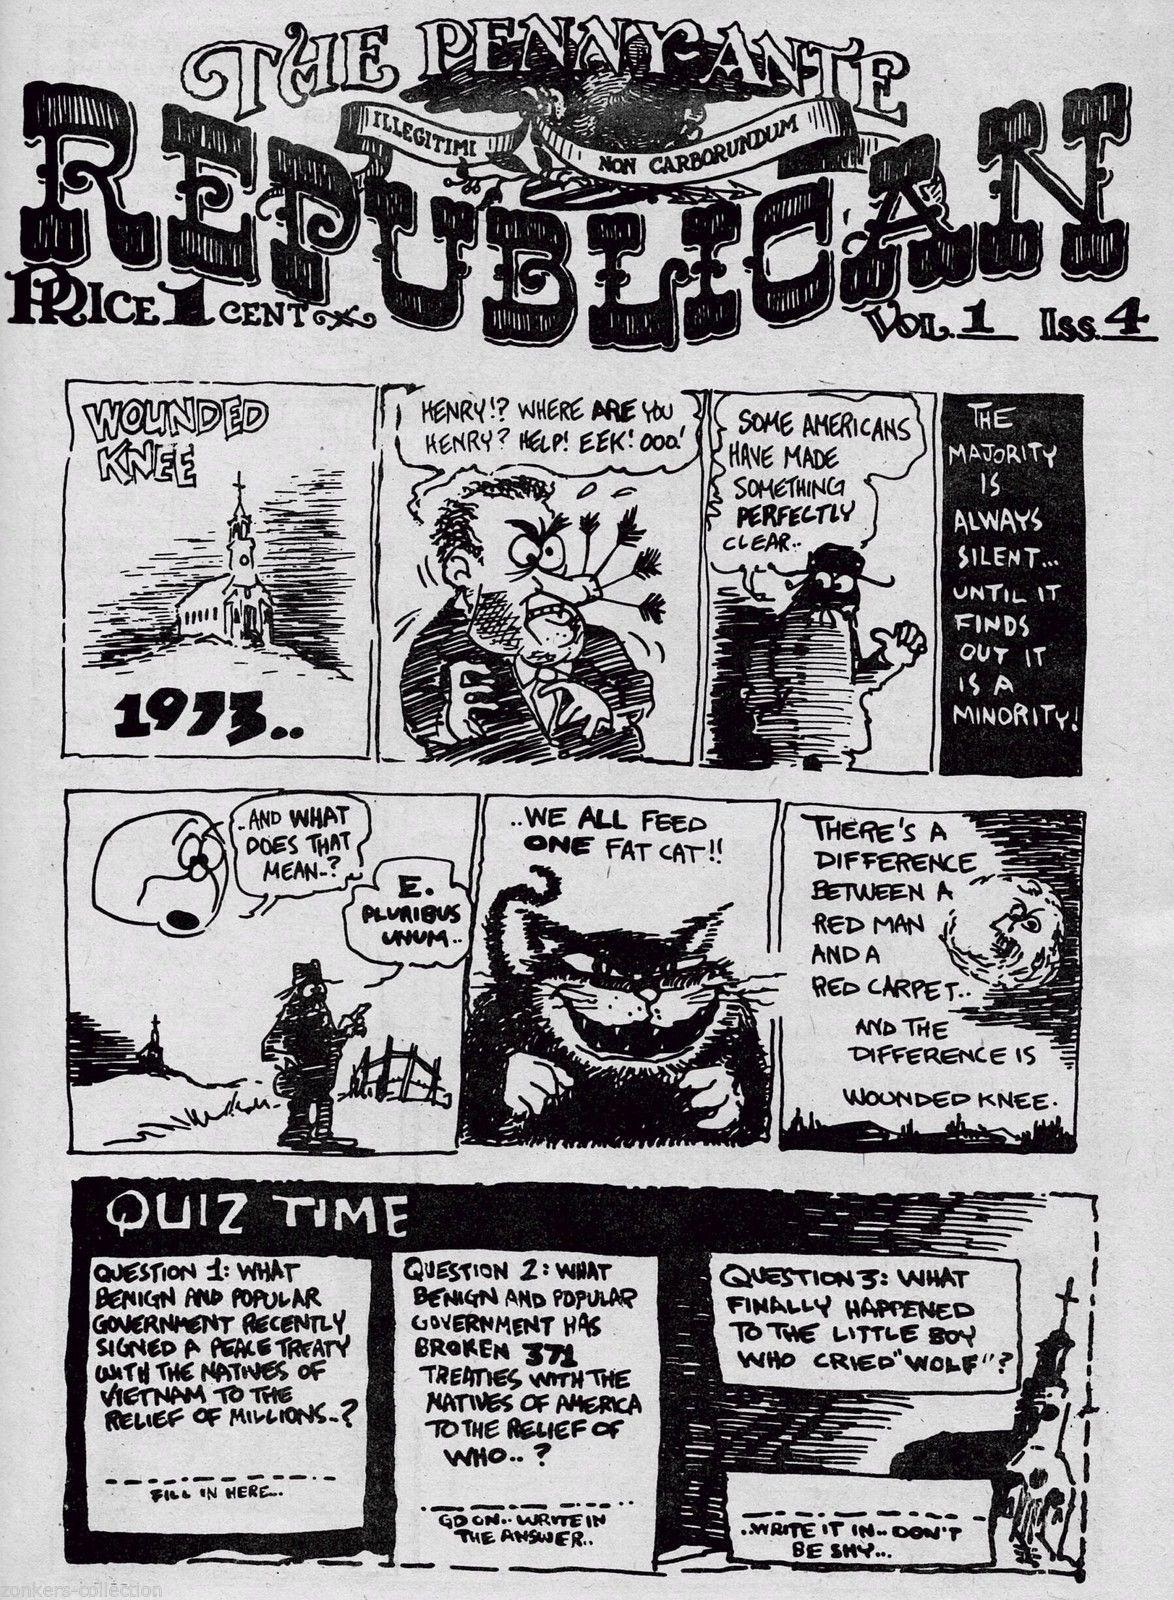 Dan O'Neill's Comics & Stories v2 #1, Hell, 1976 - Disney vs. Air Pirates,  MLF